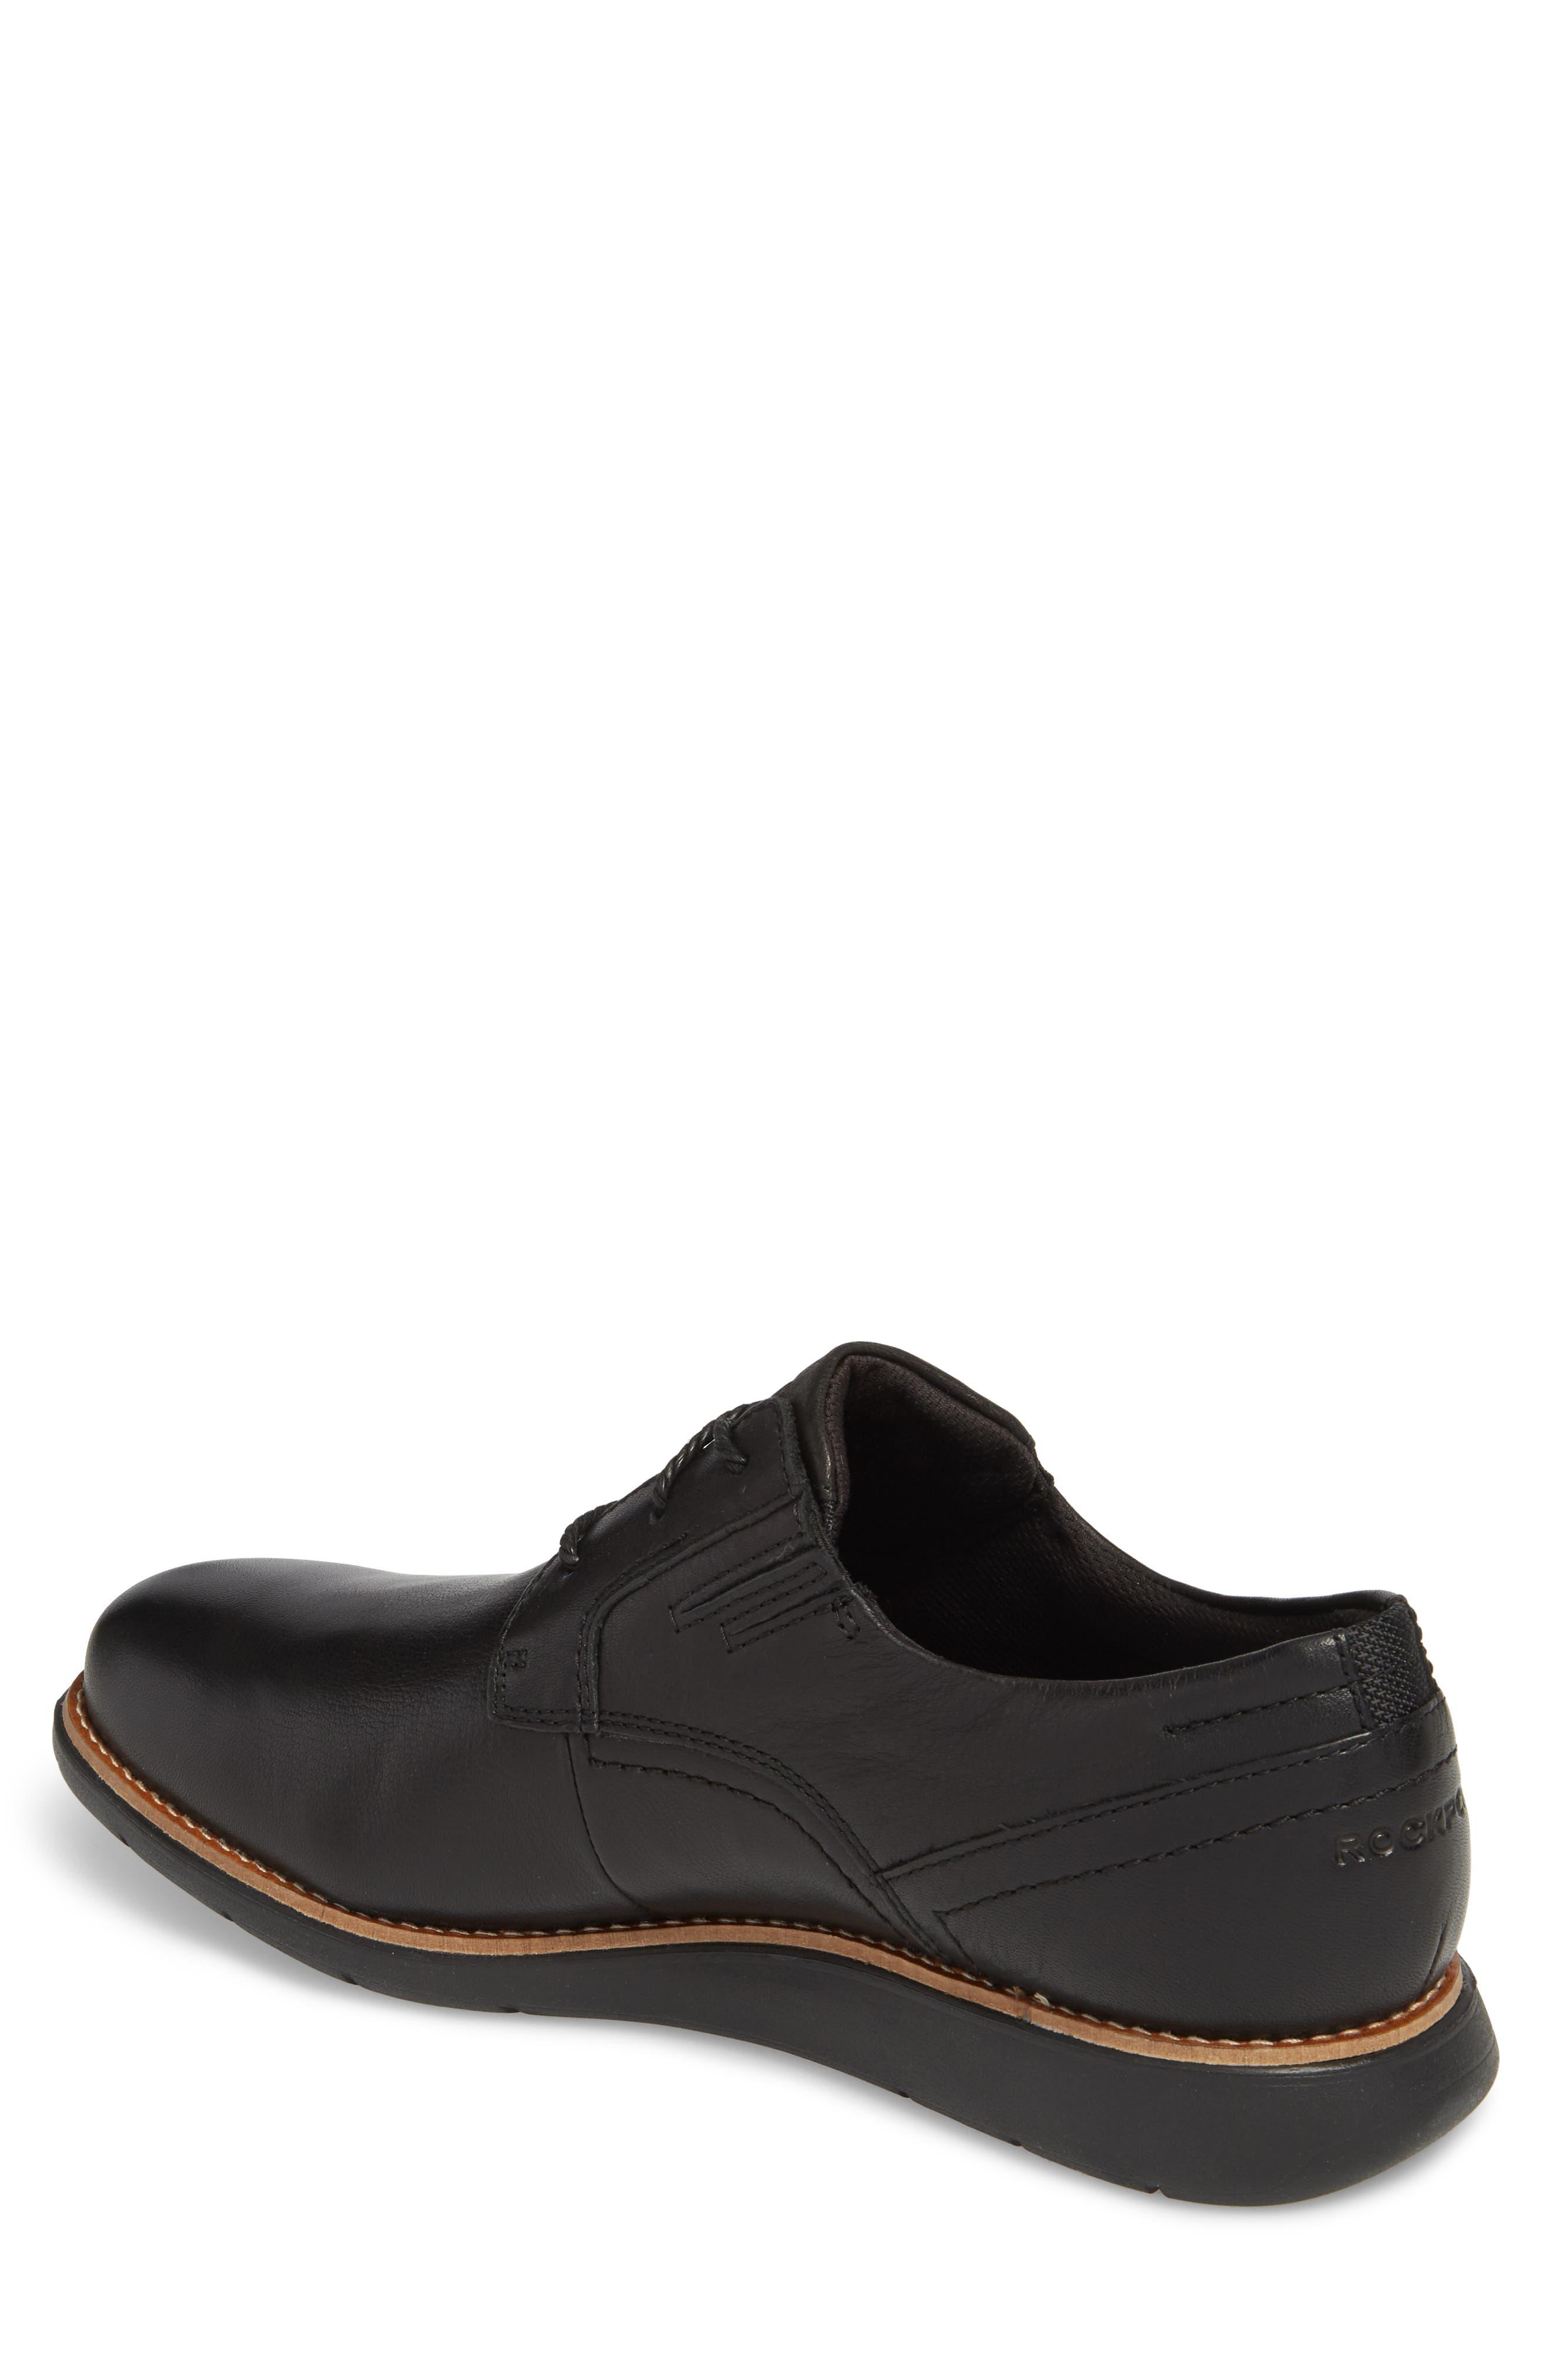 Total Motion Sport Plain Toe Derby,                             Alternate thumbnail 2, color,                             BLACK LEATHER